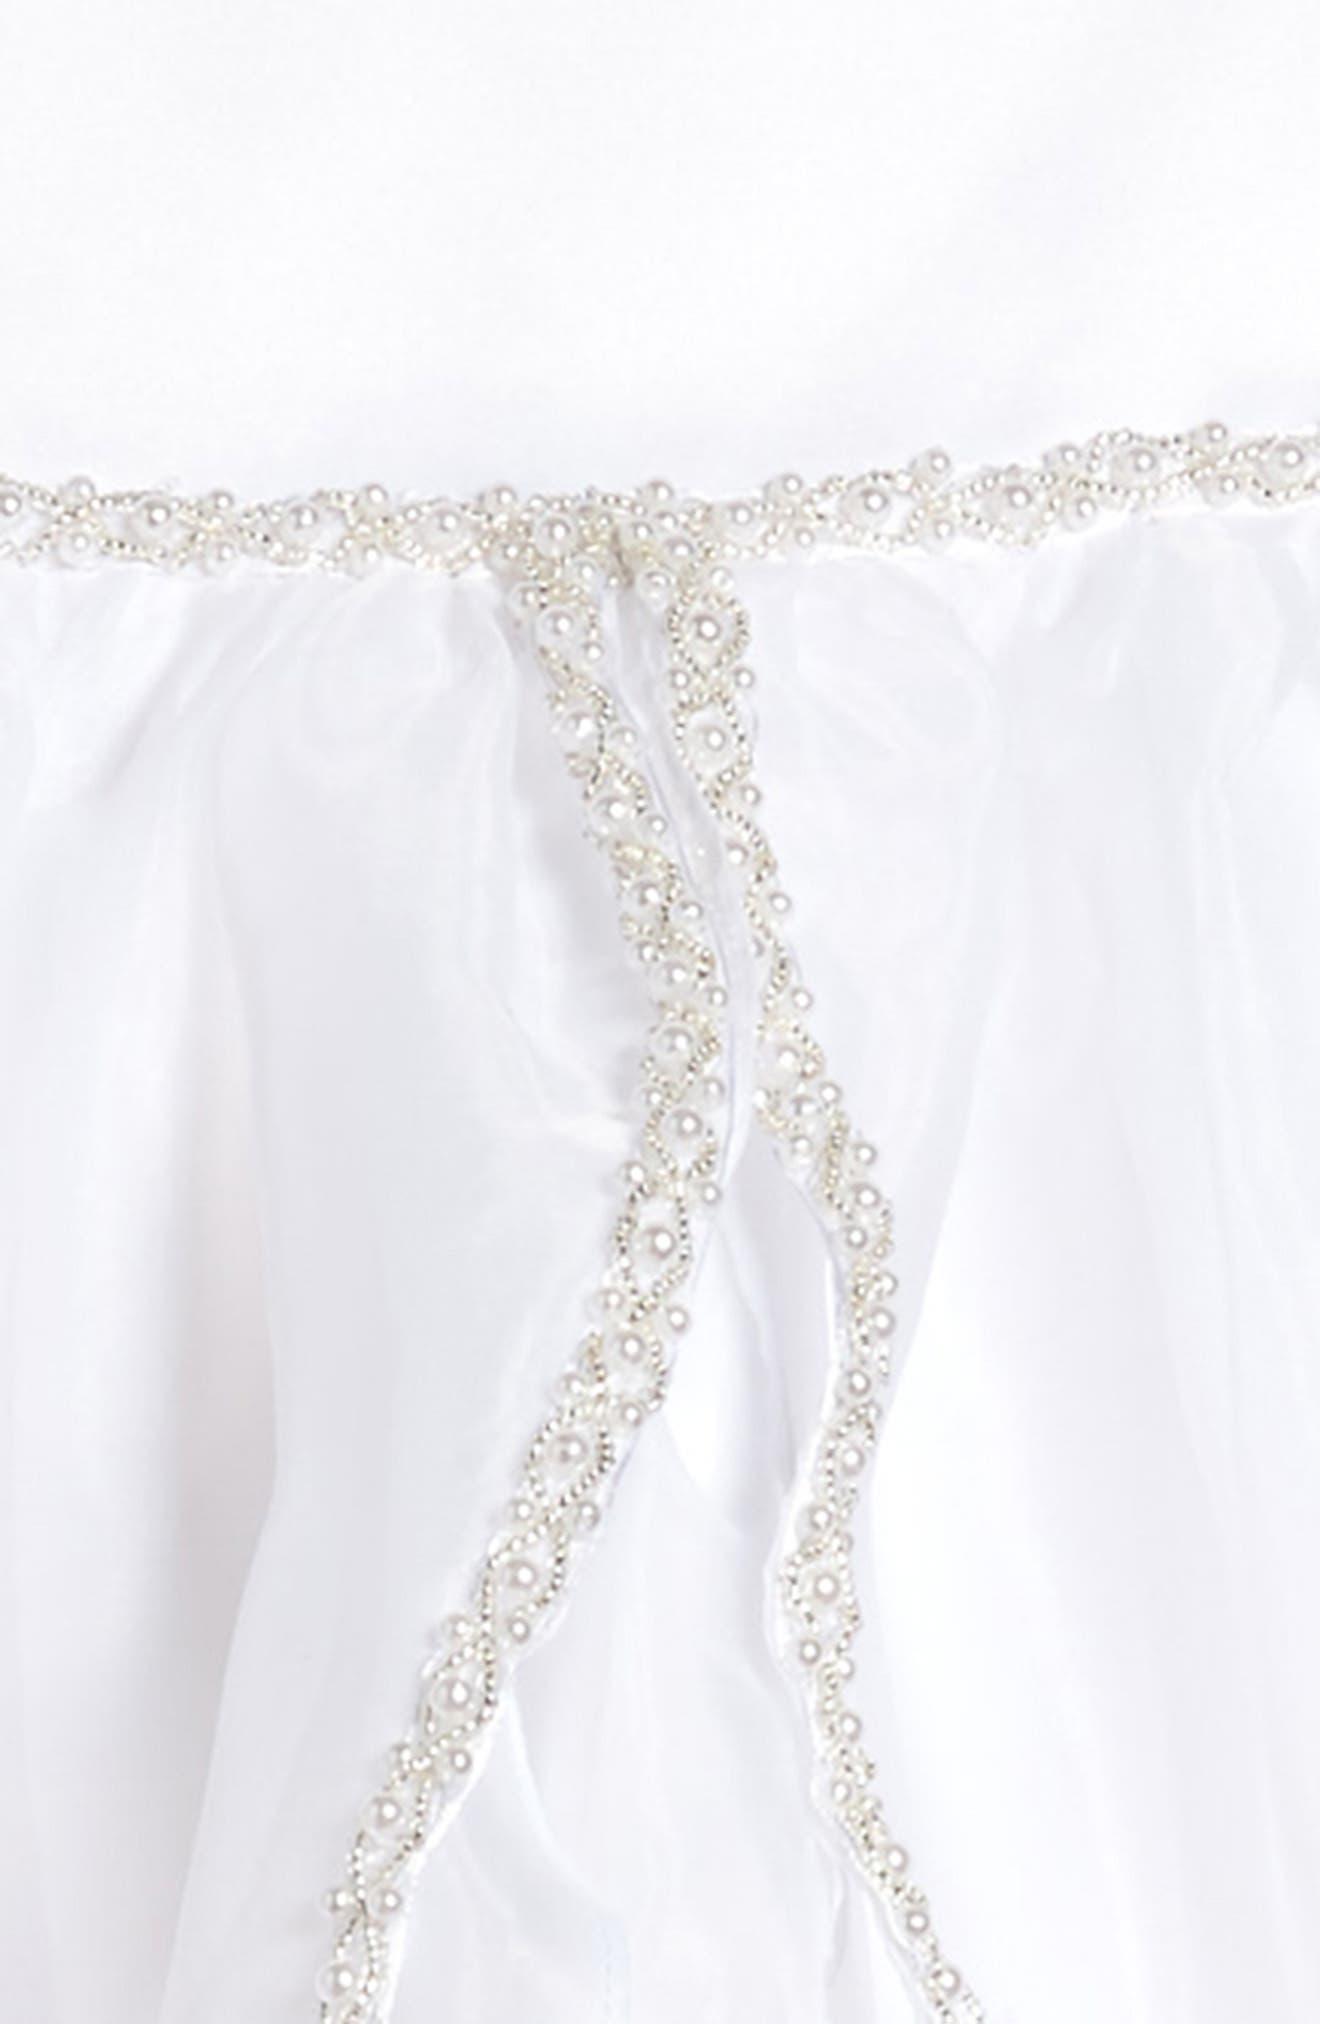 Satin & Organza Dress,                             Alternate thumbnail 3, color,                             White